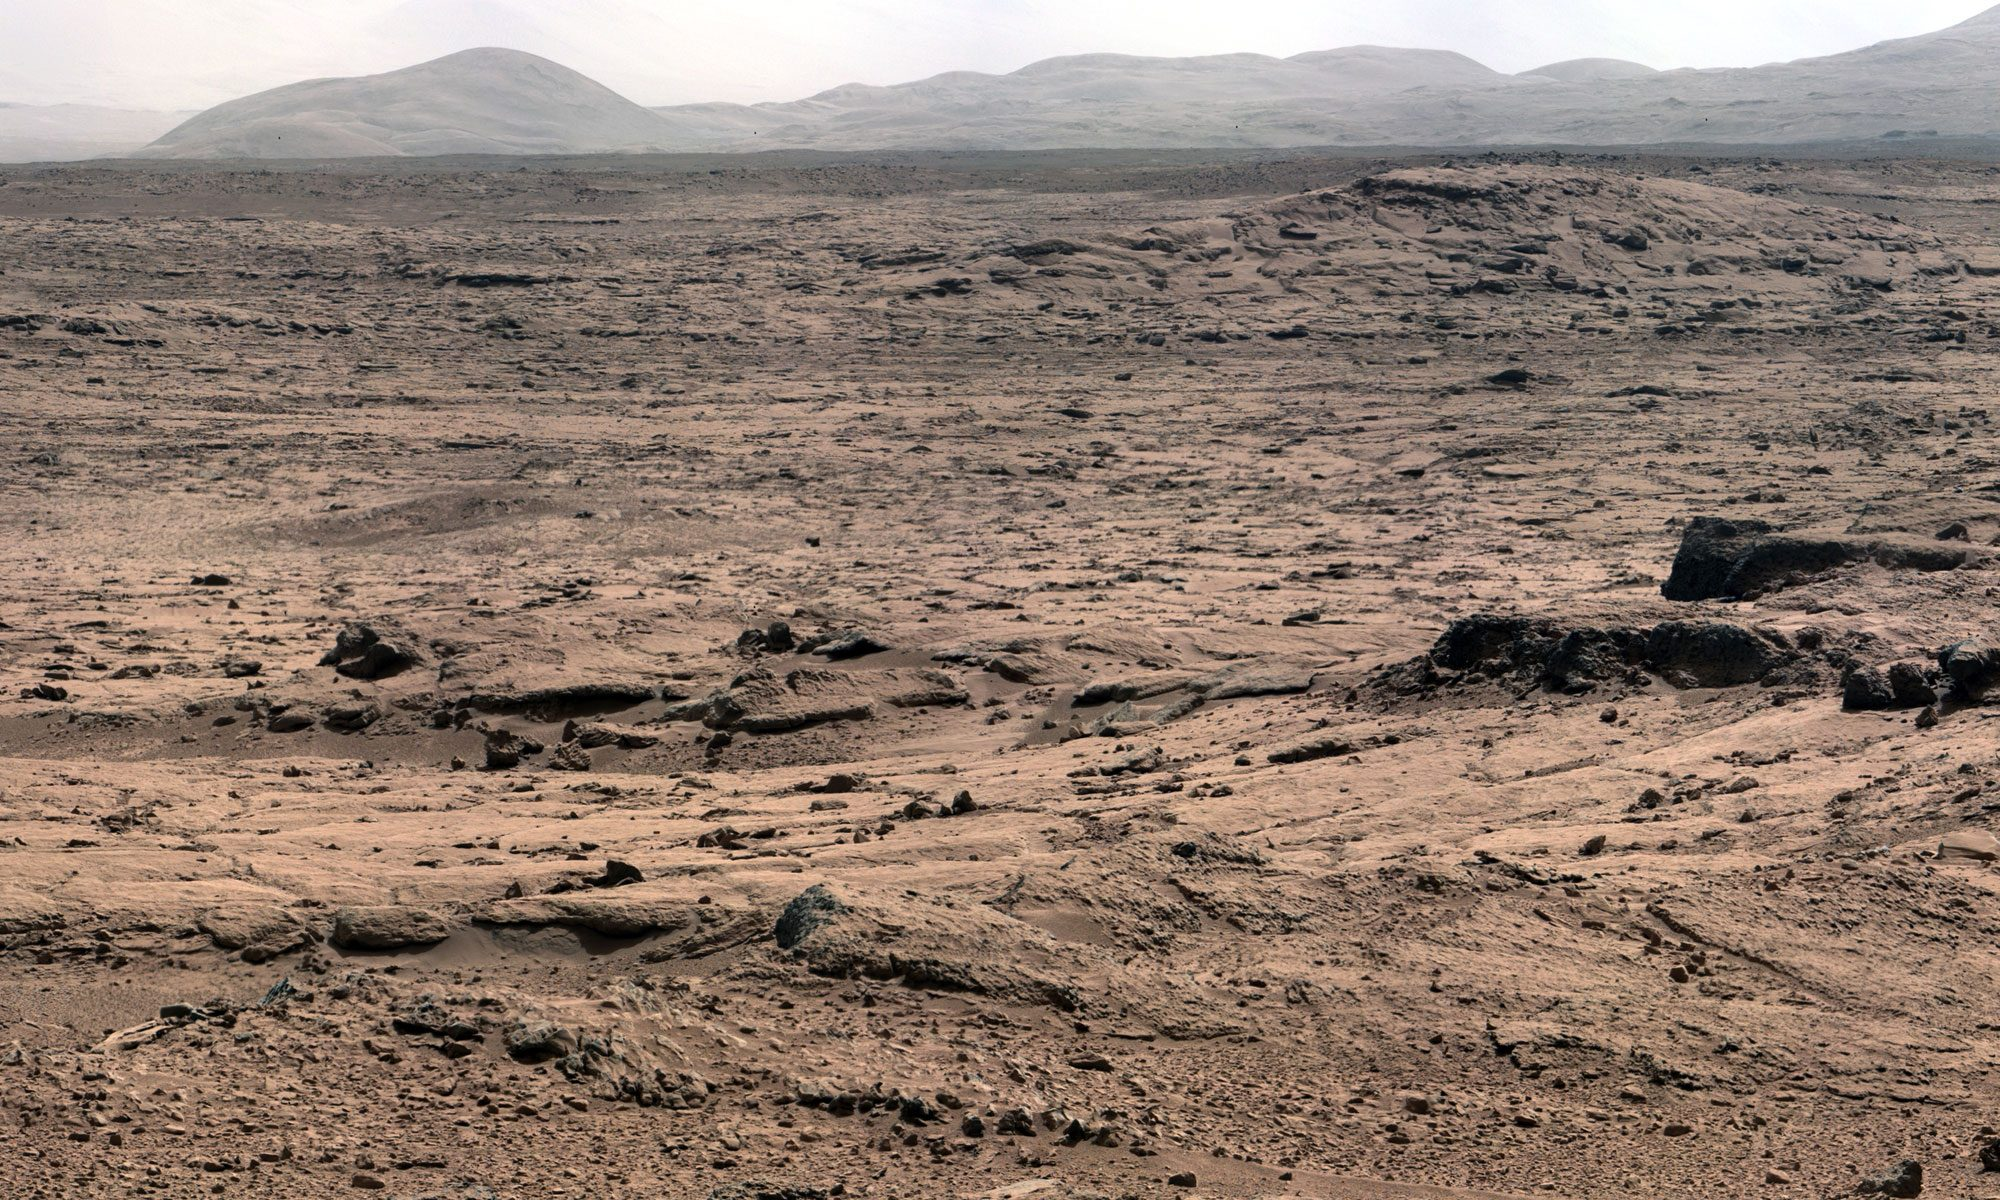 Dallas Mars